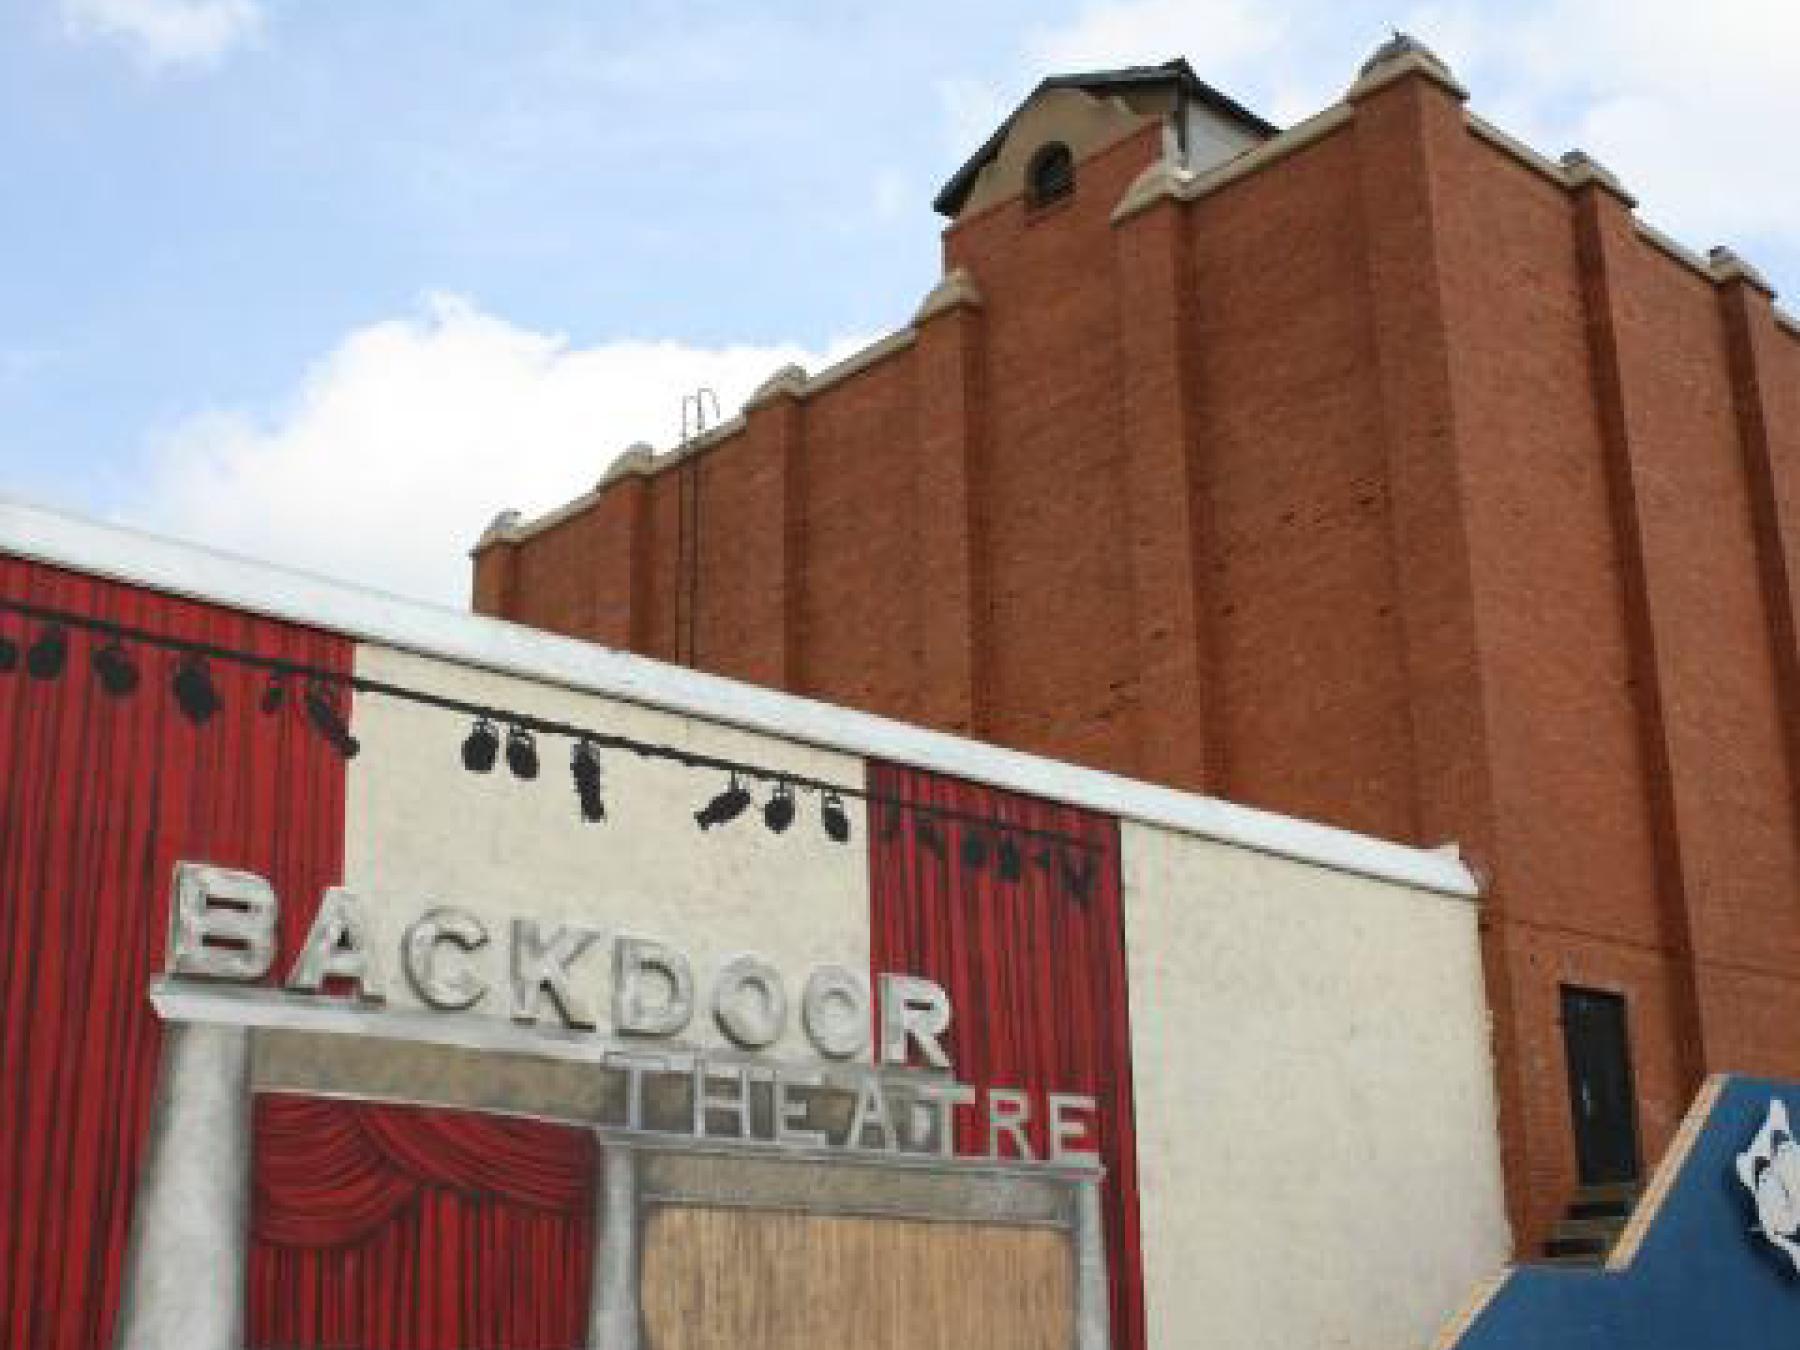 bistro express Wichita Falls backdoor theater